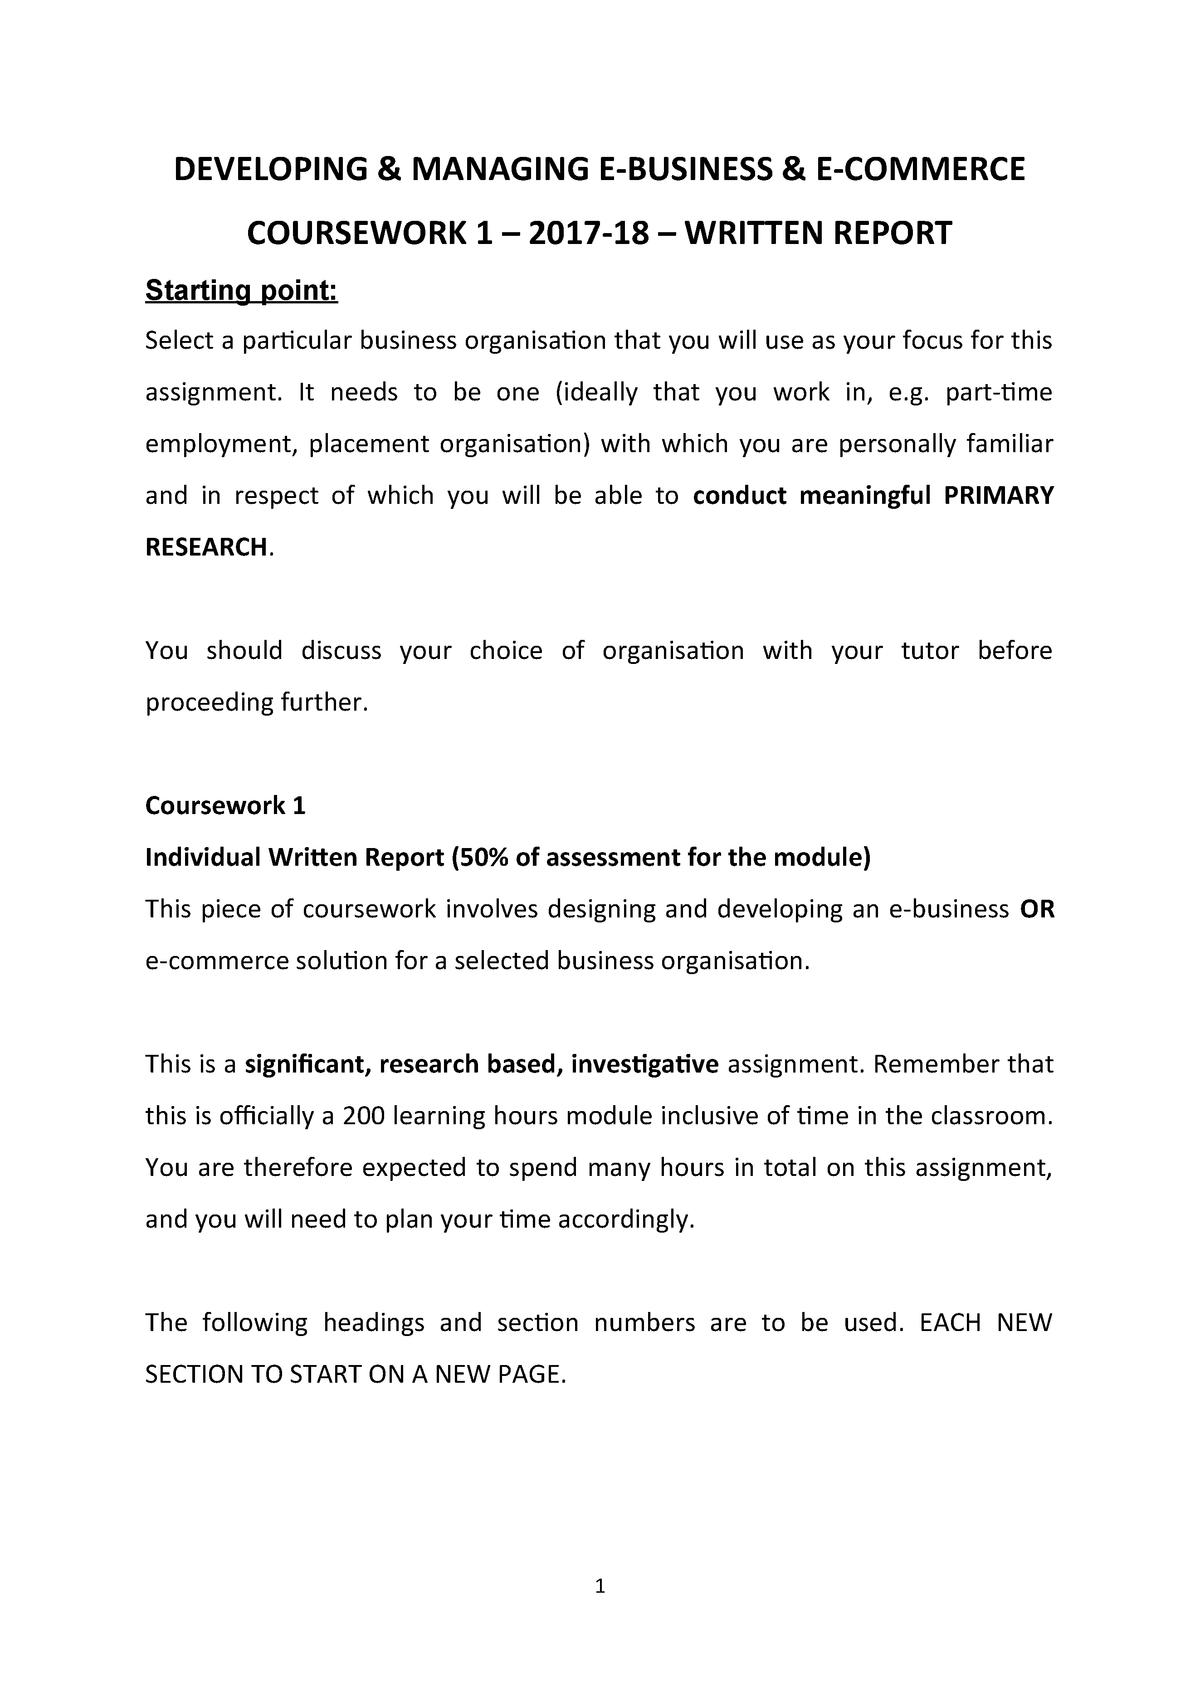 Cheap descriptive essay writing service for phd